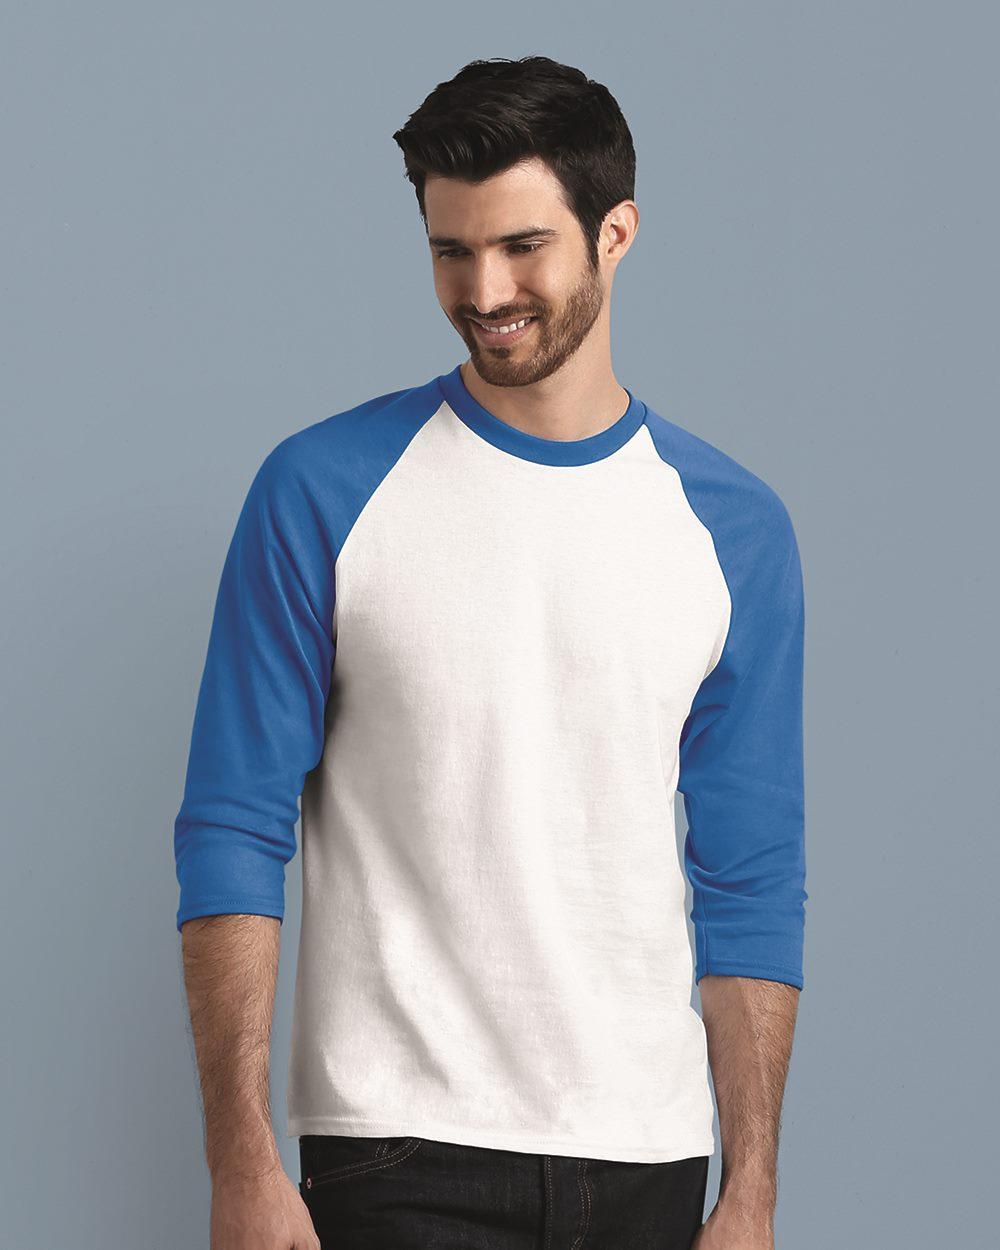 bdce4801 In Case of Emergency Press ::: Long Sleeve Tee – Gildan 5700 – Heavy Cotton  3/4 Raglan Sleeve Baseball T-Shirt